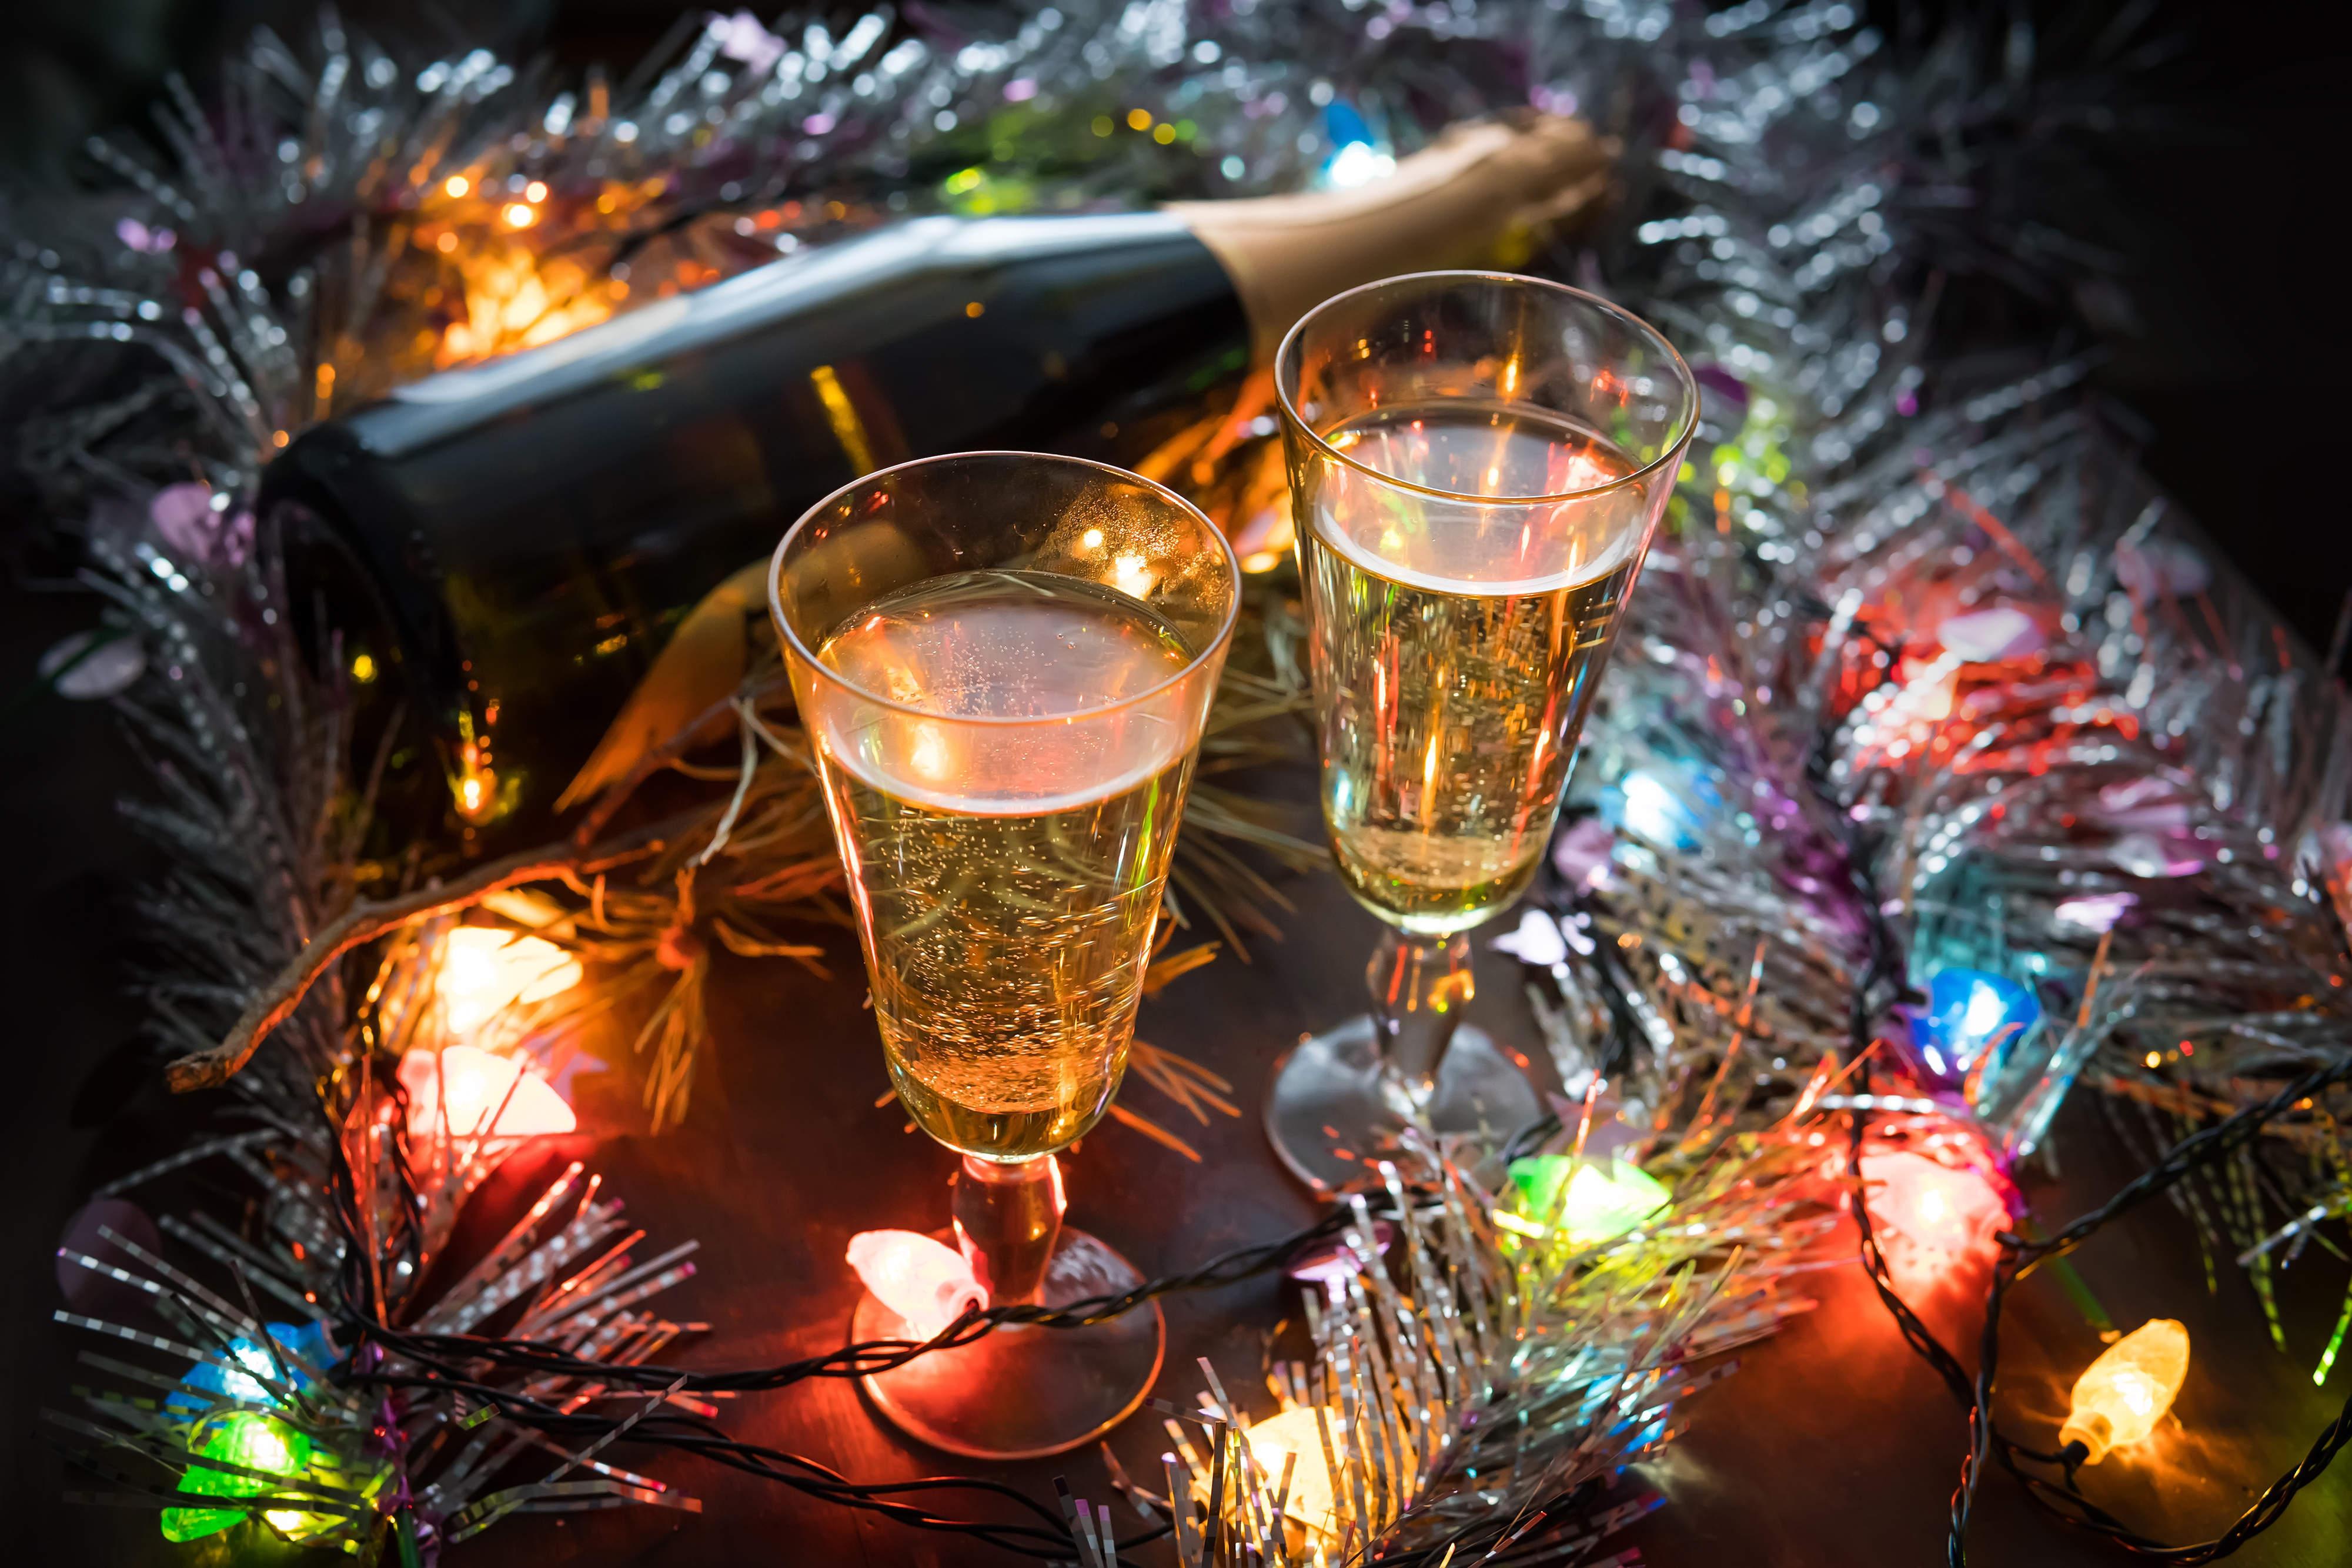 Luxury Christmas tipples to enjoy this festive season